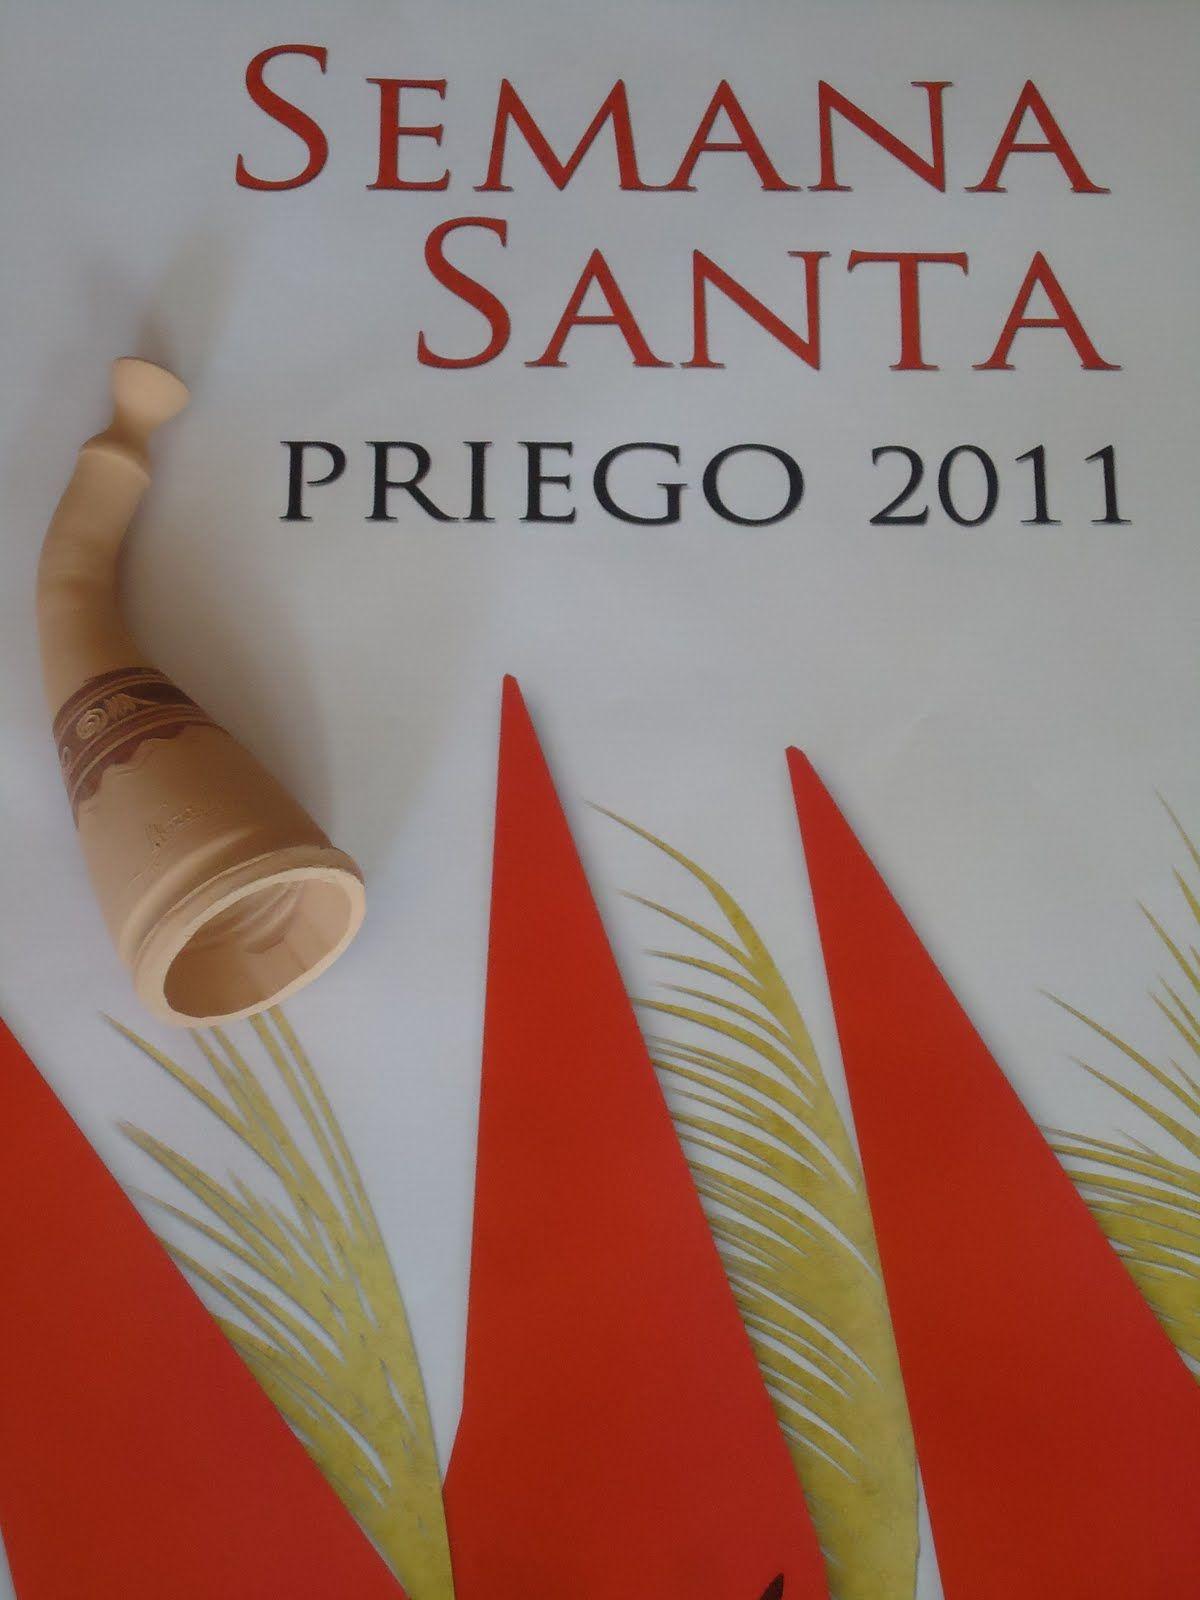 Semana Santa. Priego, 2011.